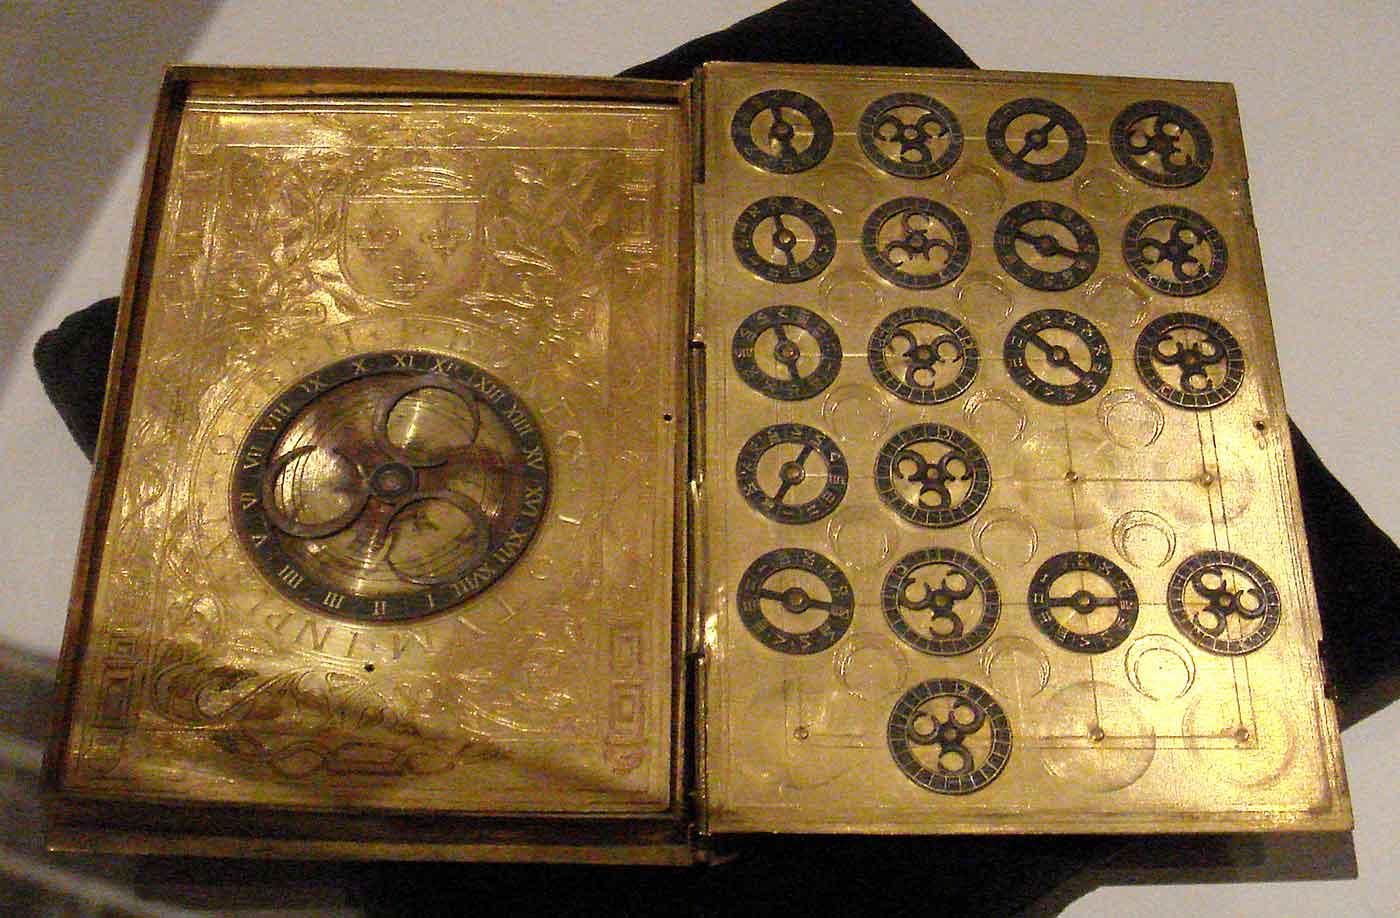 16th century French cypher machine